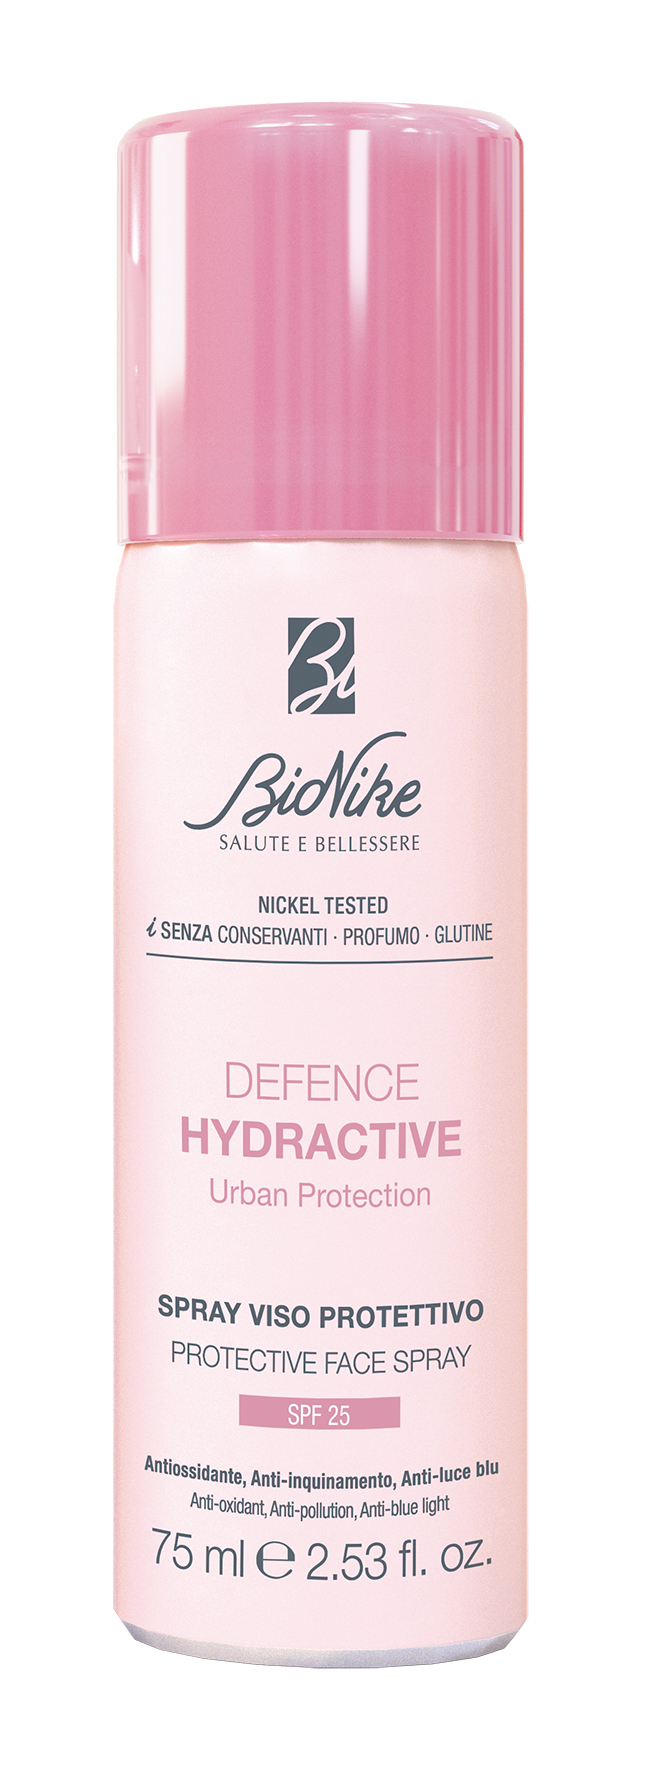 BioNike Defence Hydractive Urban Protection Spray Viso SPF25